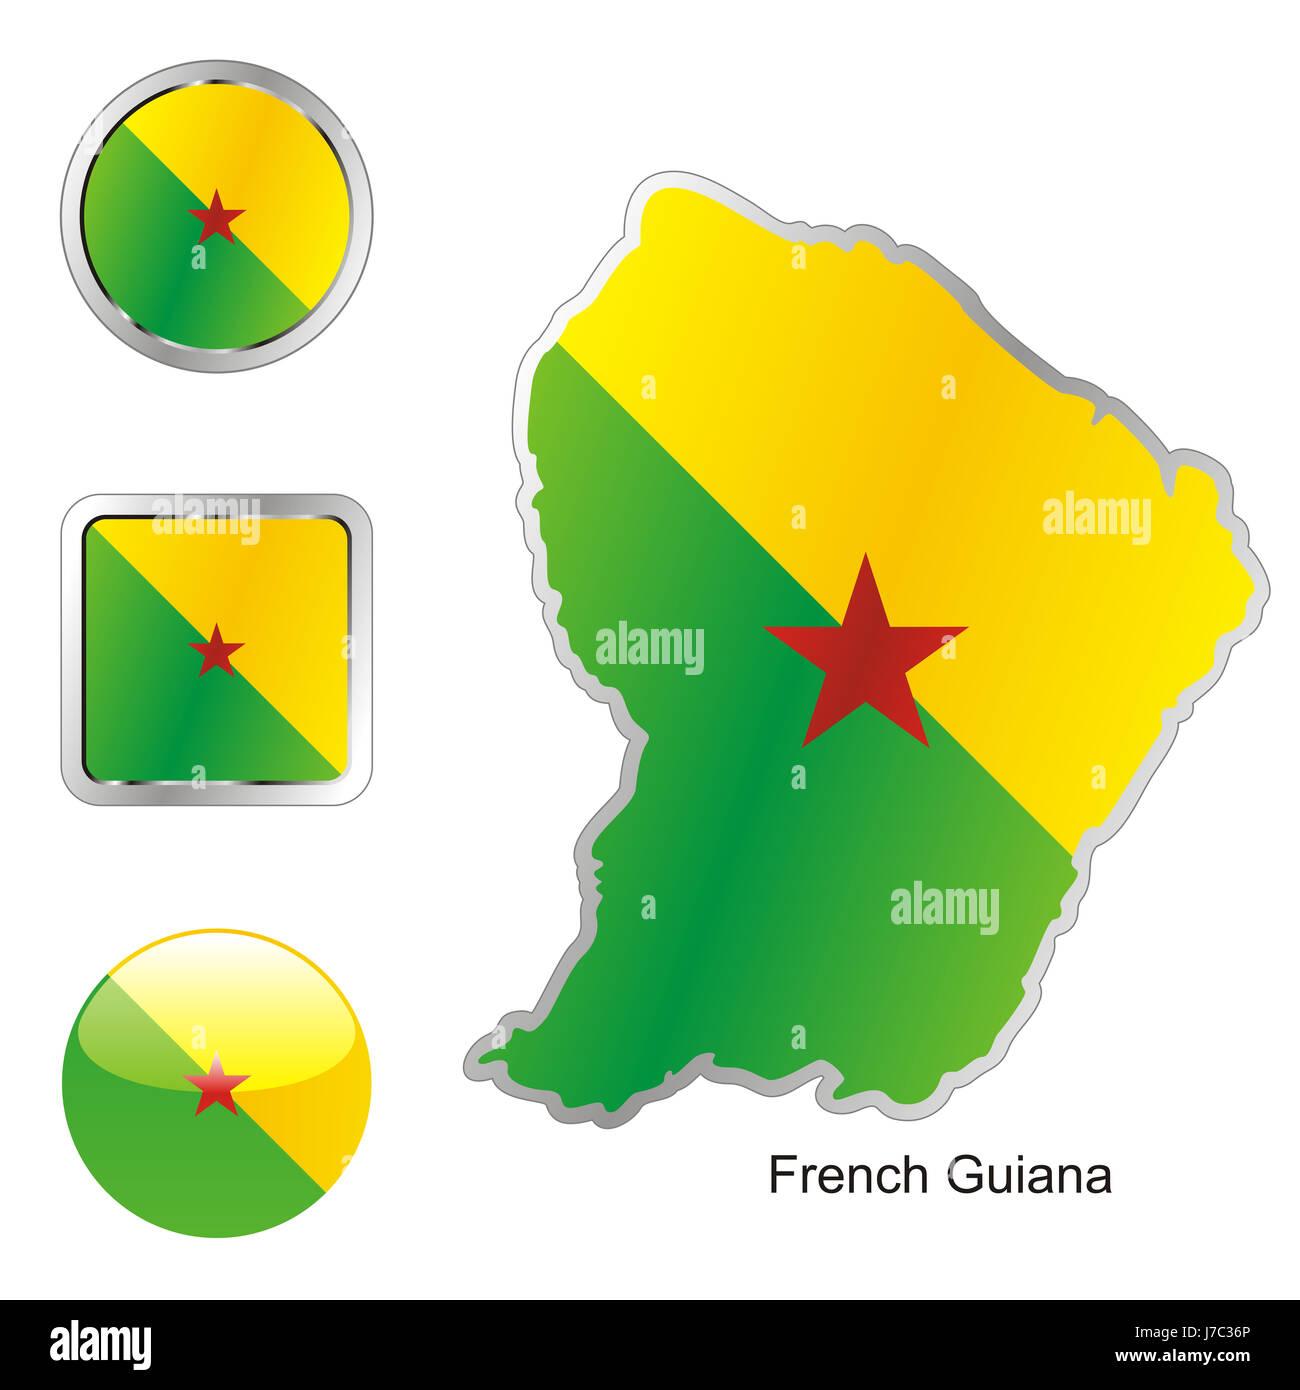 america illustration flag button french travel colour emblem america - Stock Image